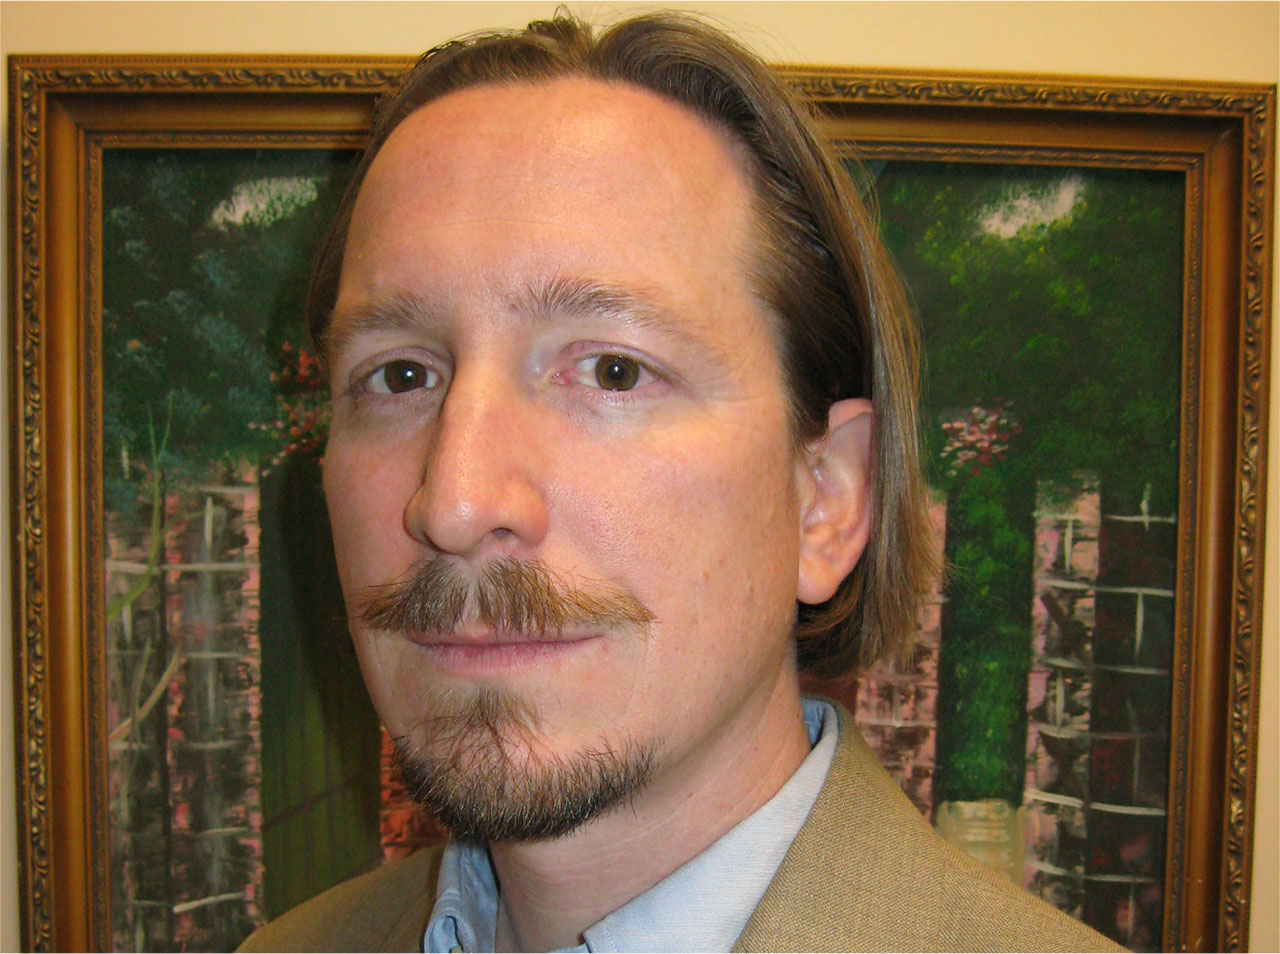 headshot of Aaron Pitluck